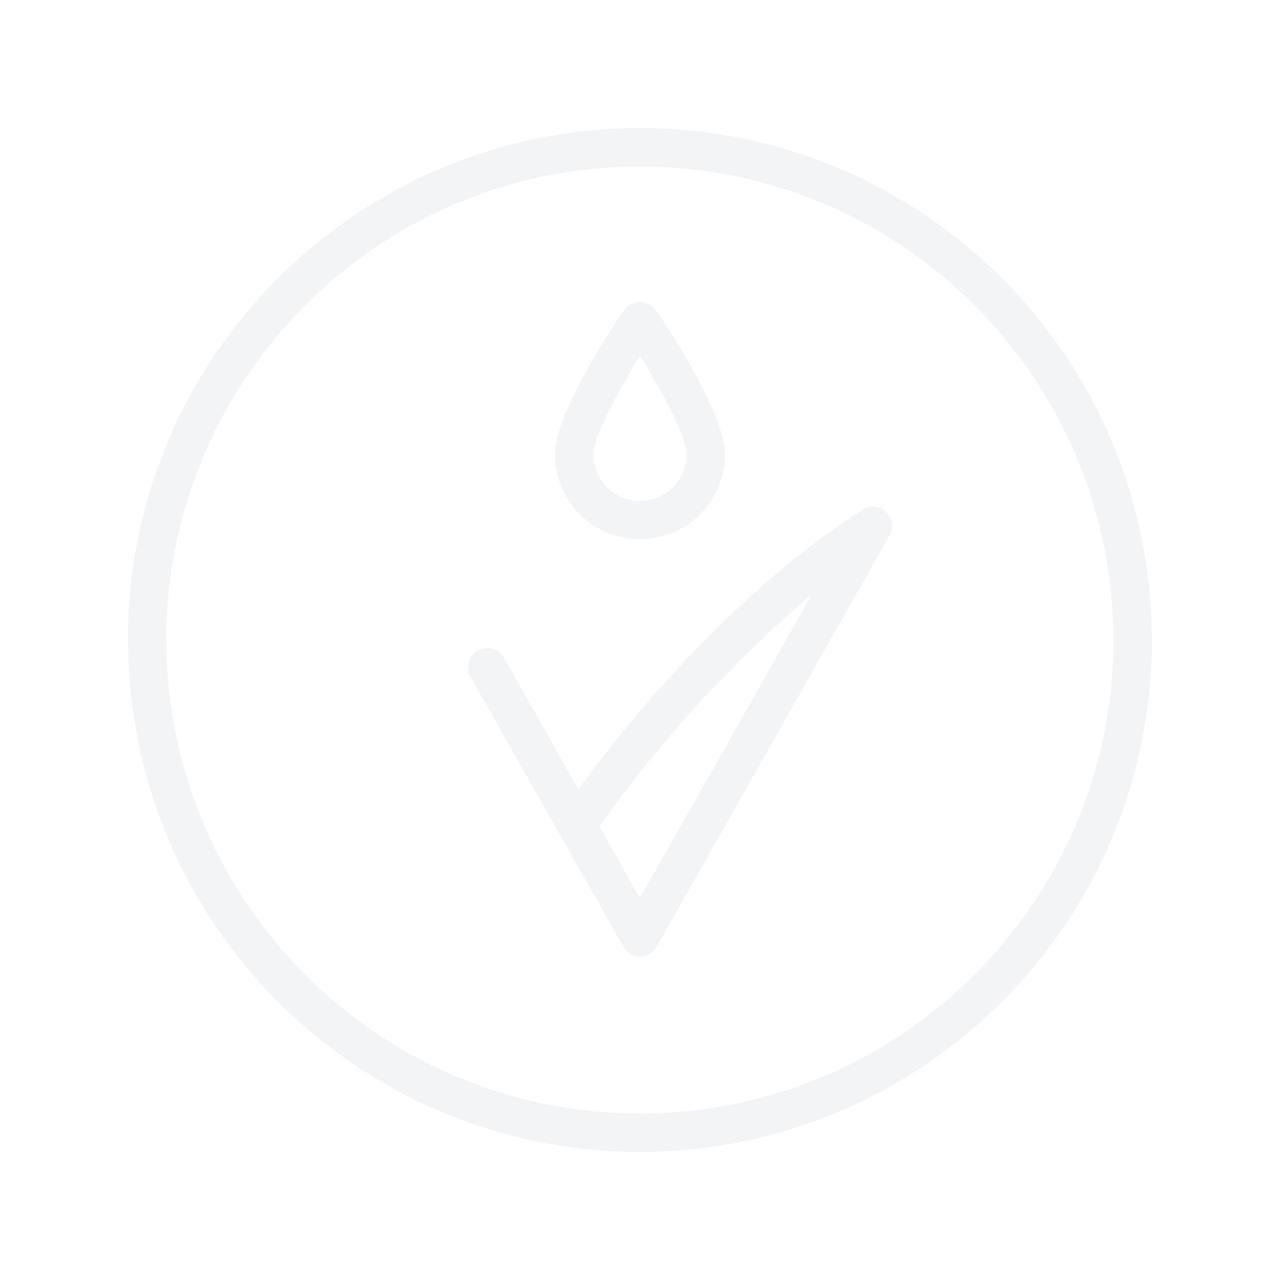 TONYMOLY The Chok Chok Green Tea Watery Skin Toner 180ml